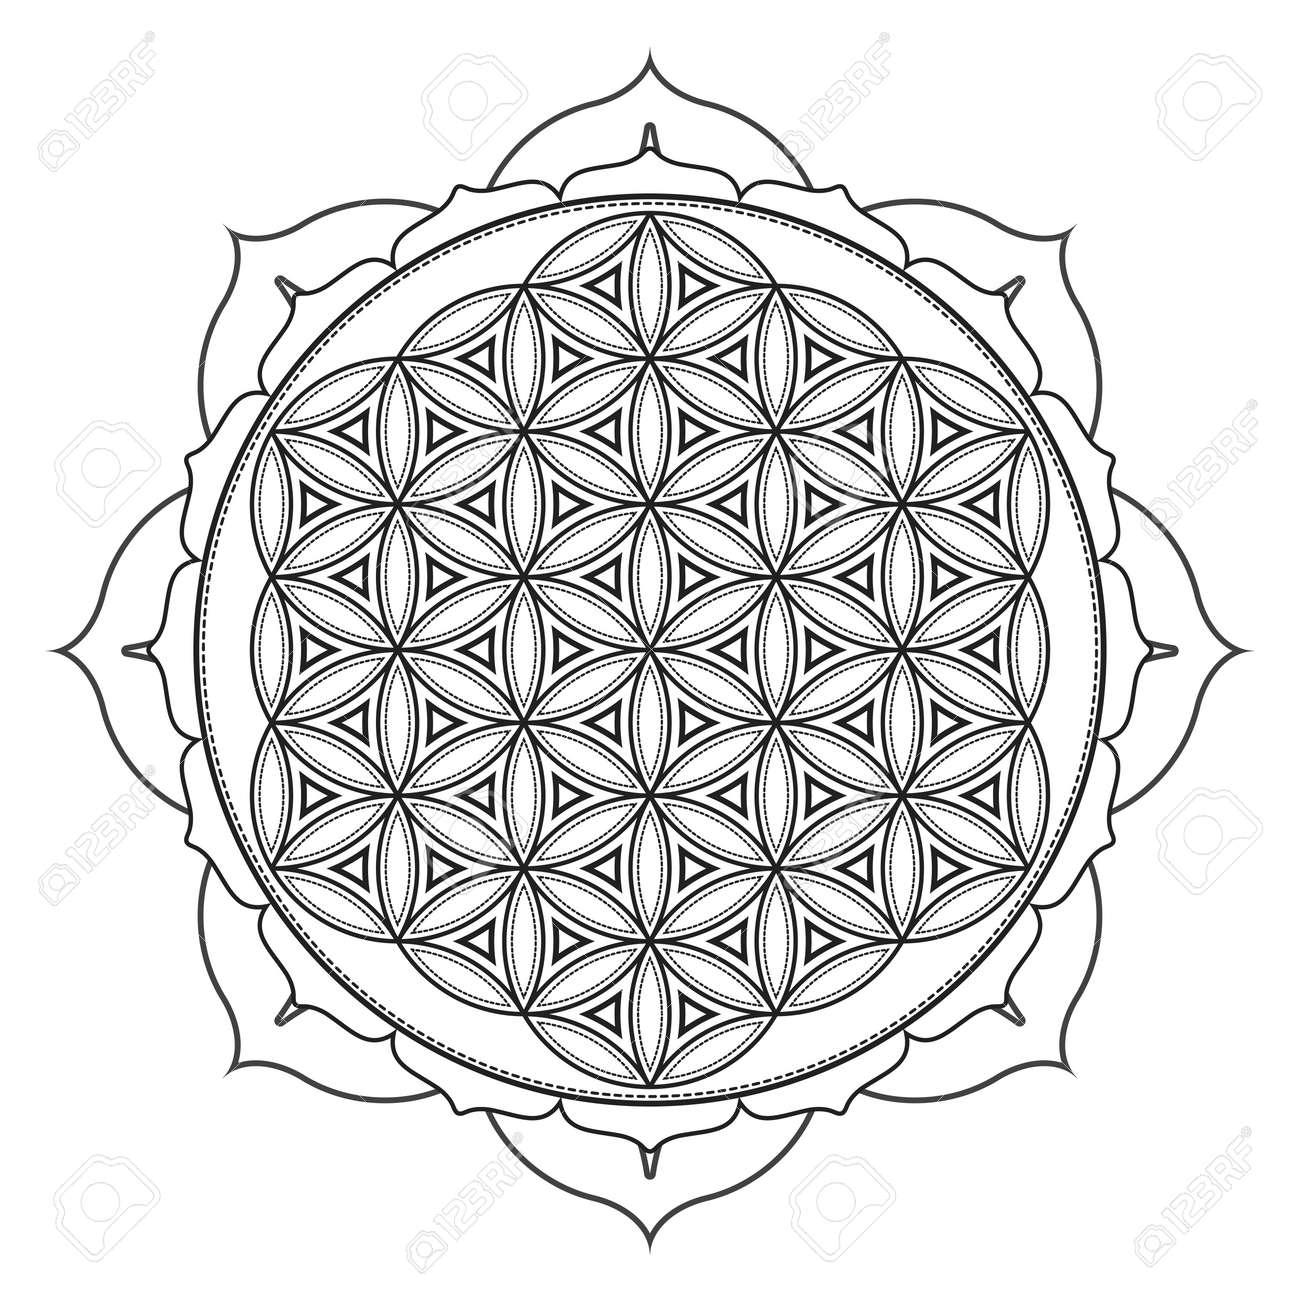 Vector Contour Zwart Wit Ontwerp Mandala Heilige Geometrie